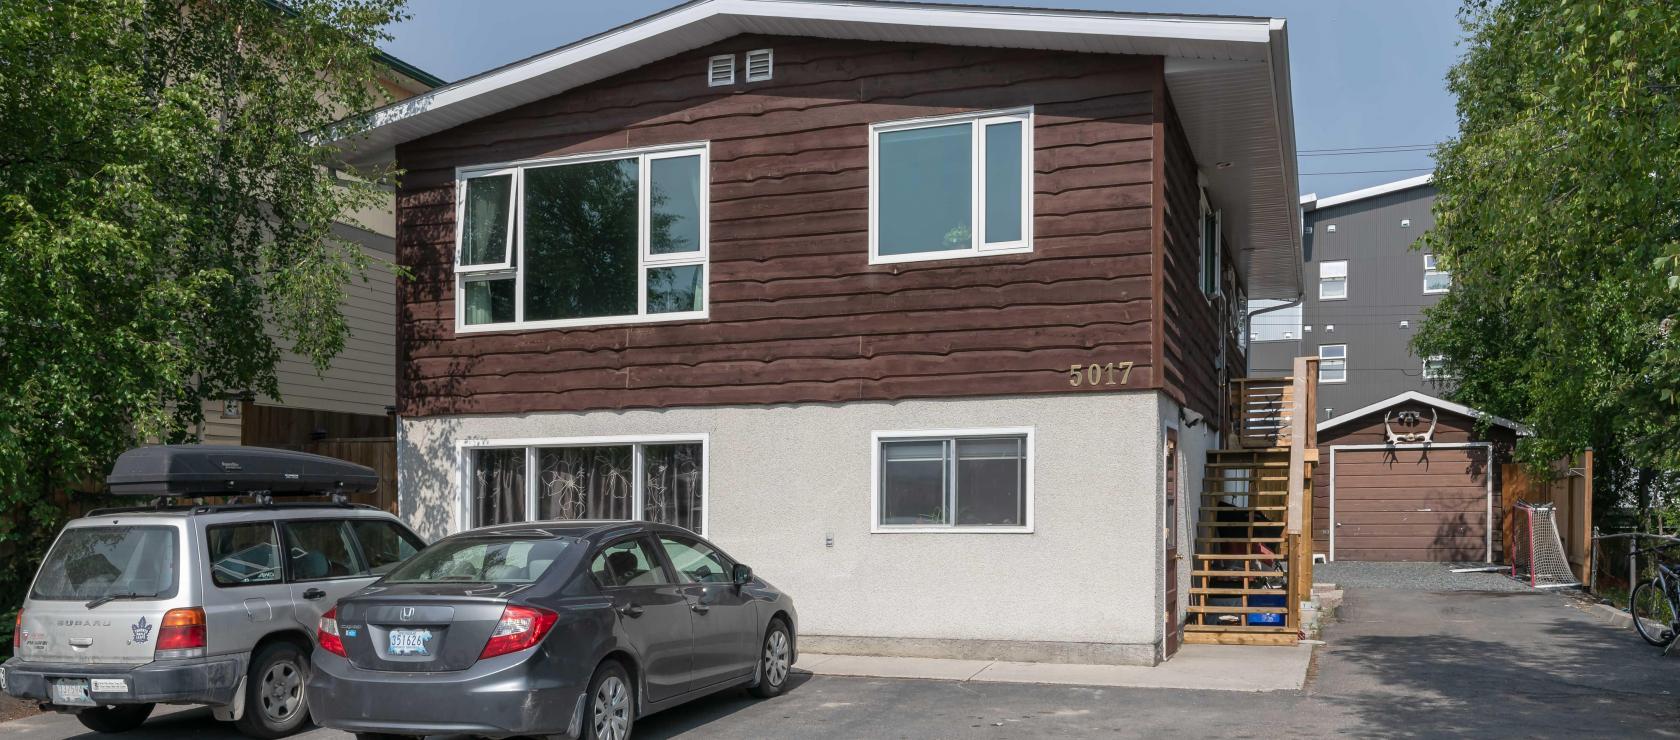 5017 54th Street, Downtown, Yellowknife 2